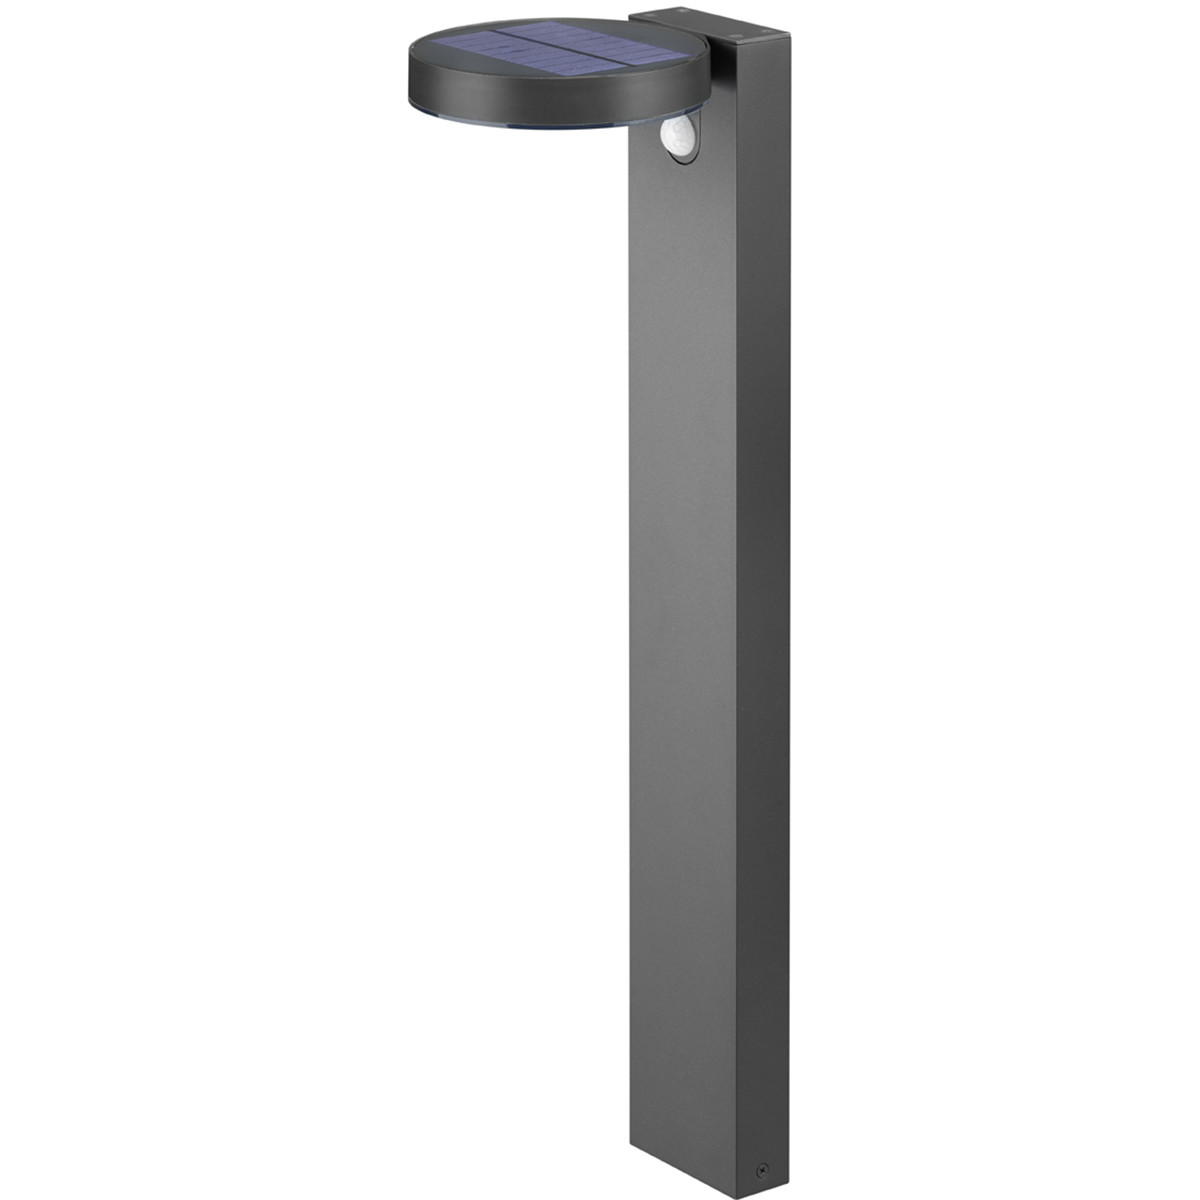 LED Solar Tuinverlichting - Paal/Sokkel - Trion Posino - Zonne-energie - Bewegingssensor - 4W - Antr